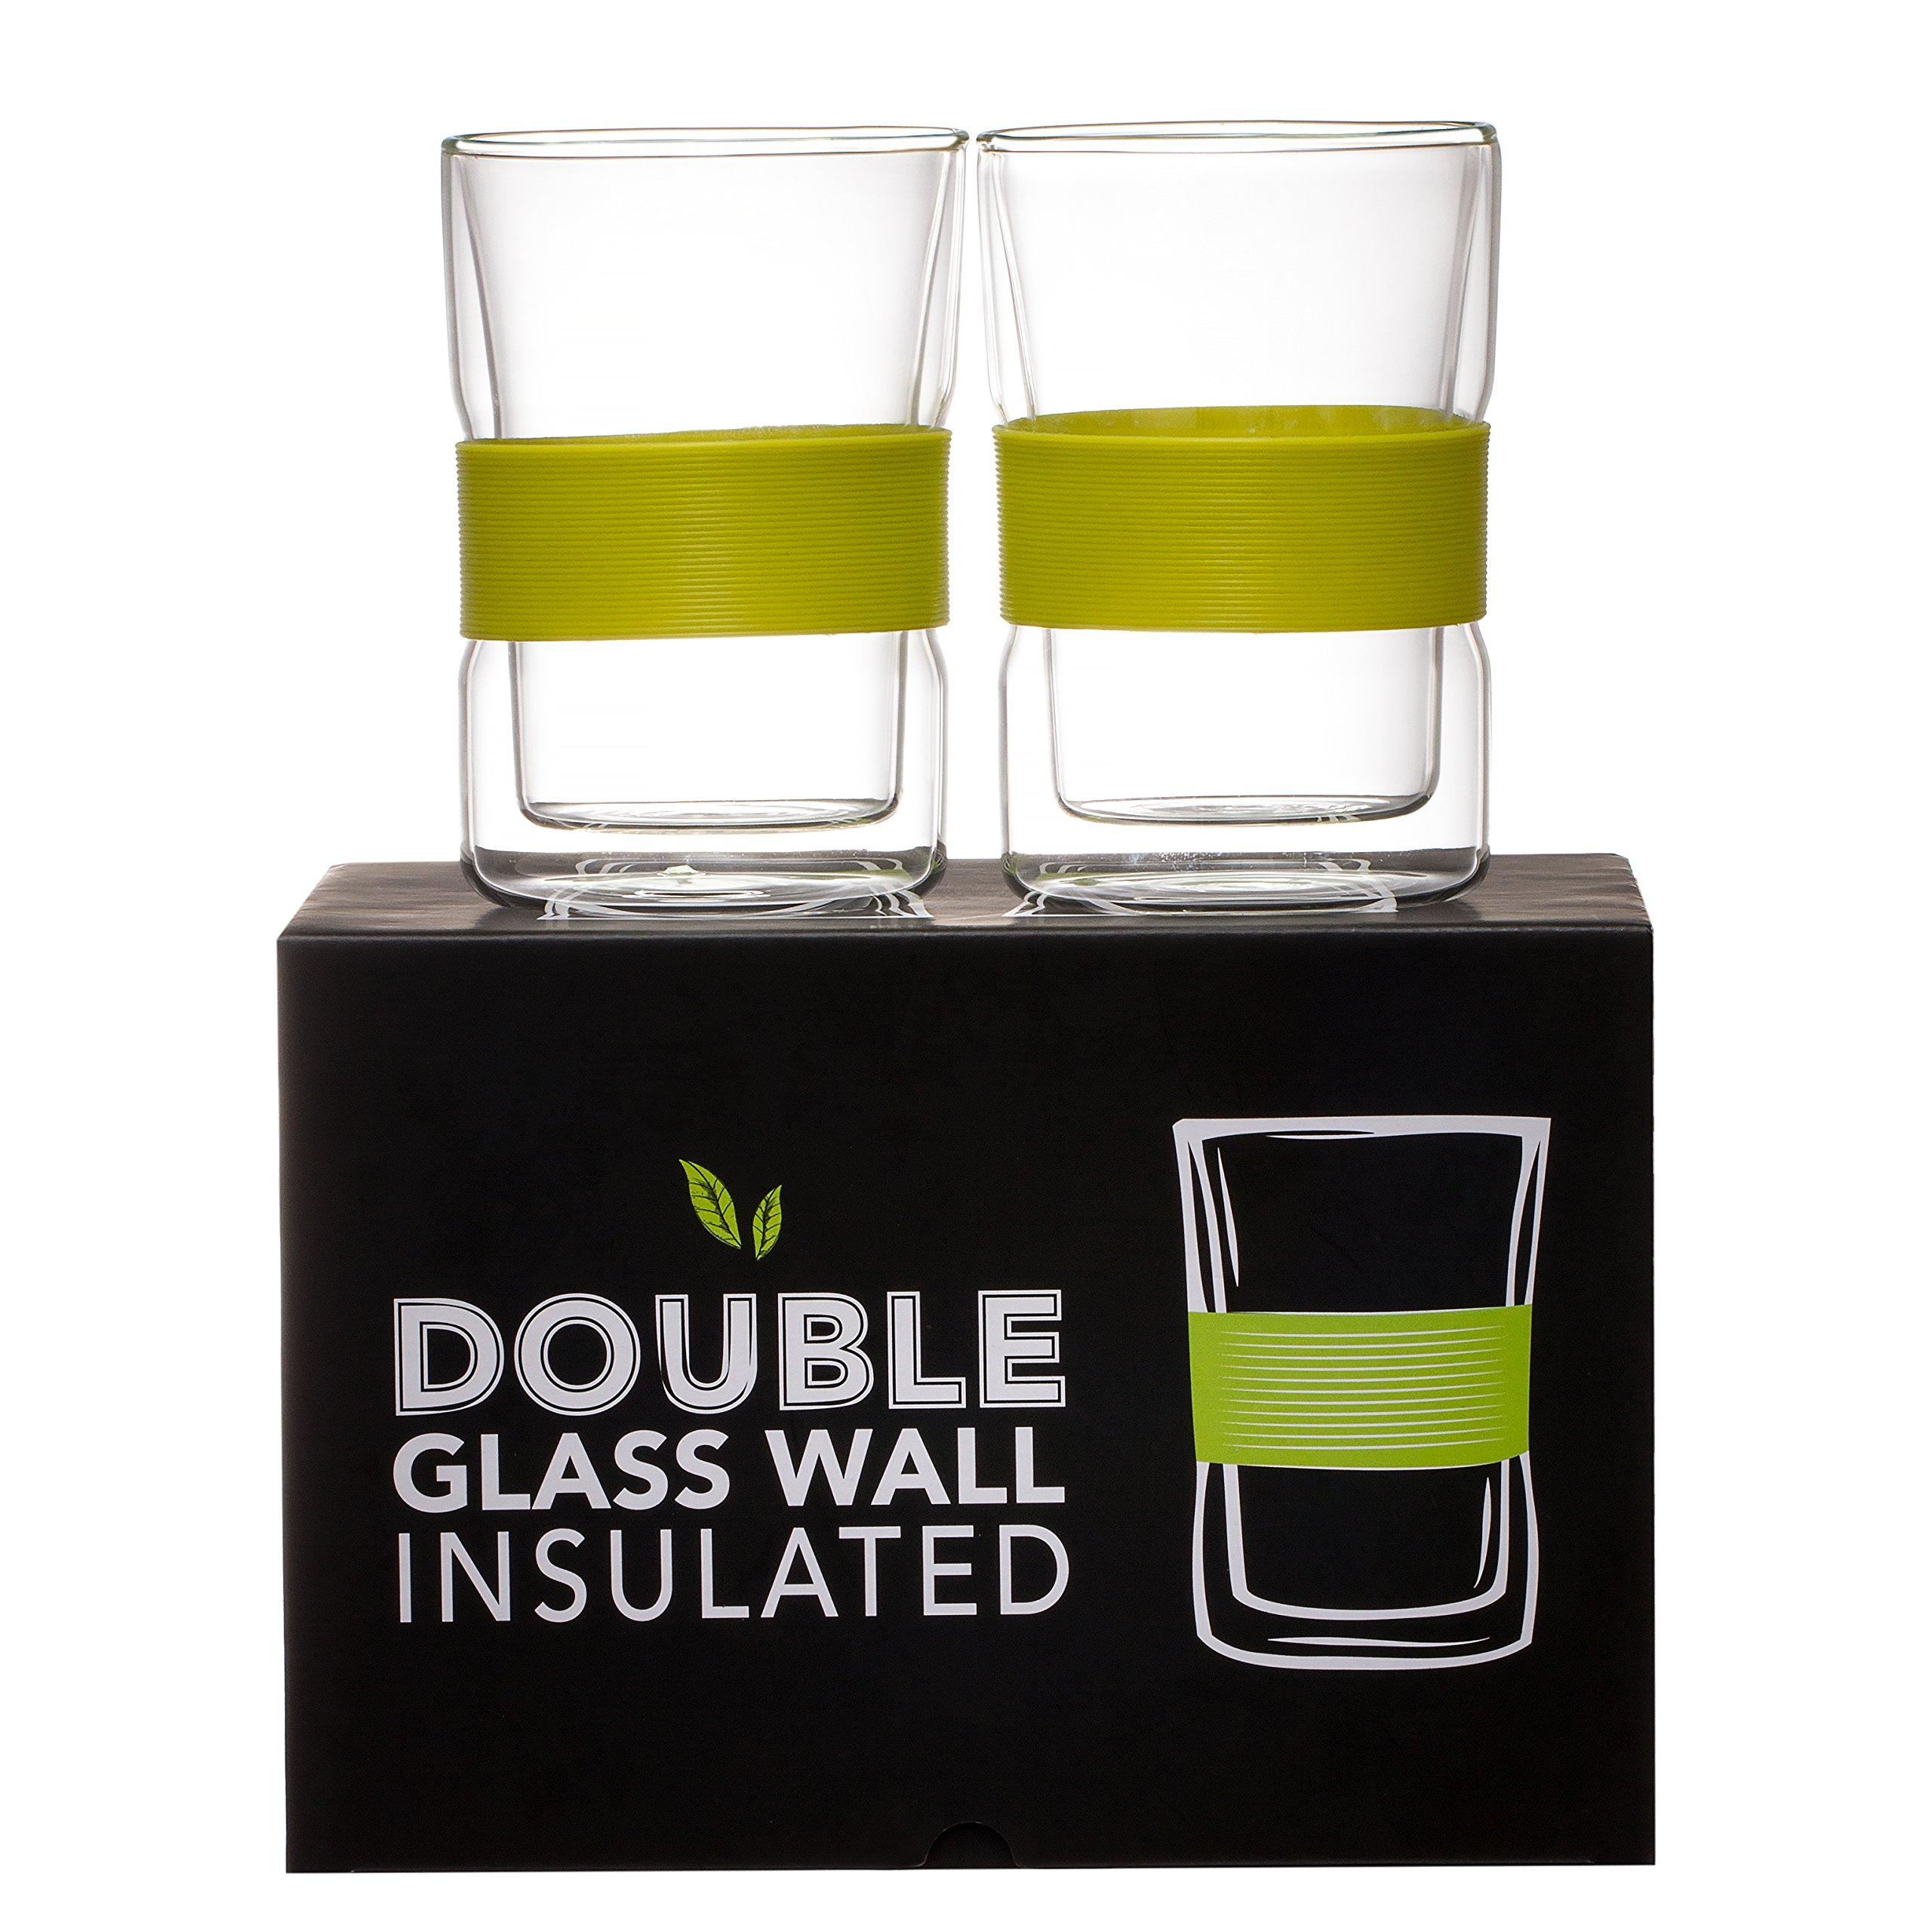 Prana Coffee Mug, Double Wall Insulated Tea Glass, Clear Cup With Gift Box (Set Of 2 Mugs) 10 oz